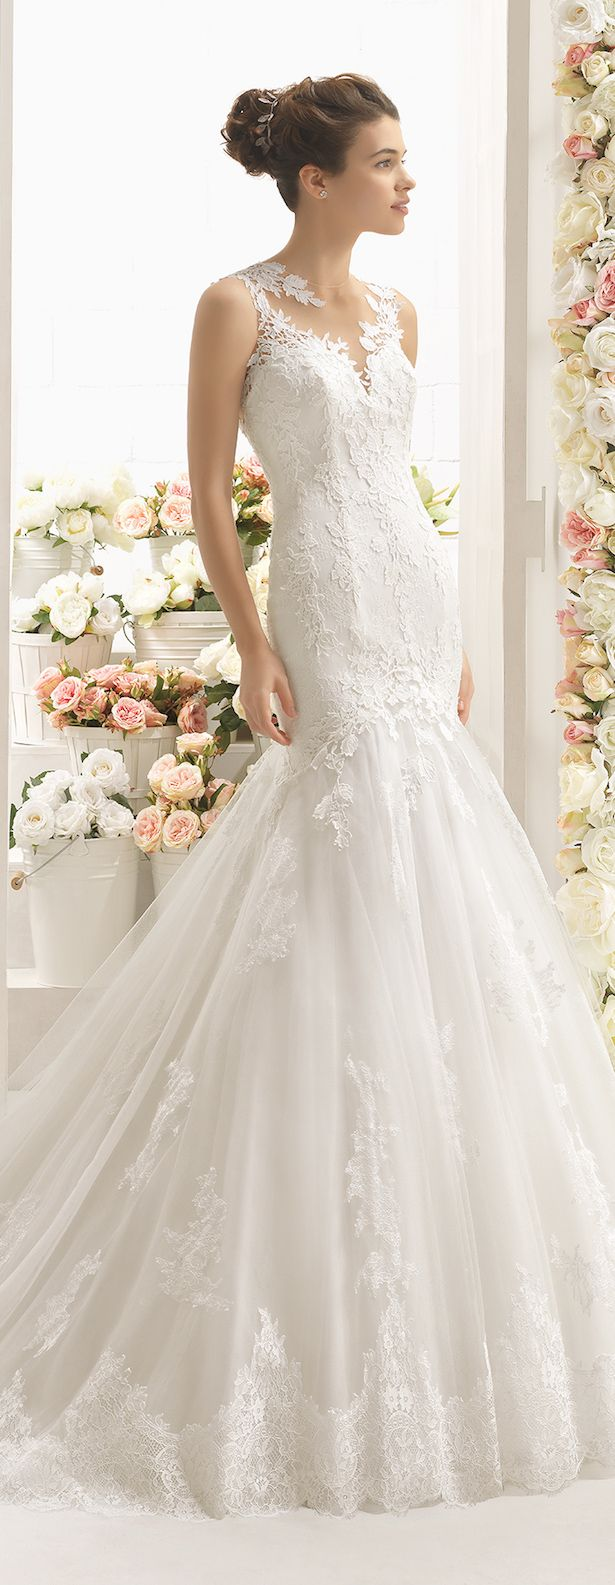 1632 best wedding dresses images on pinterest | wedding dressses